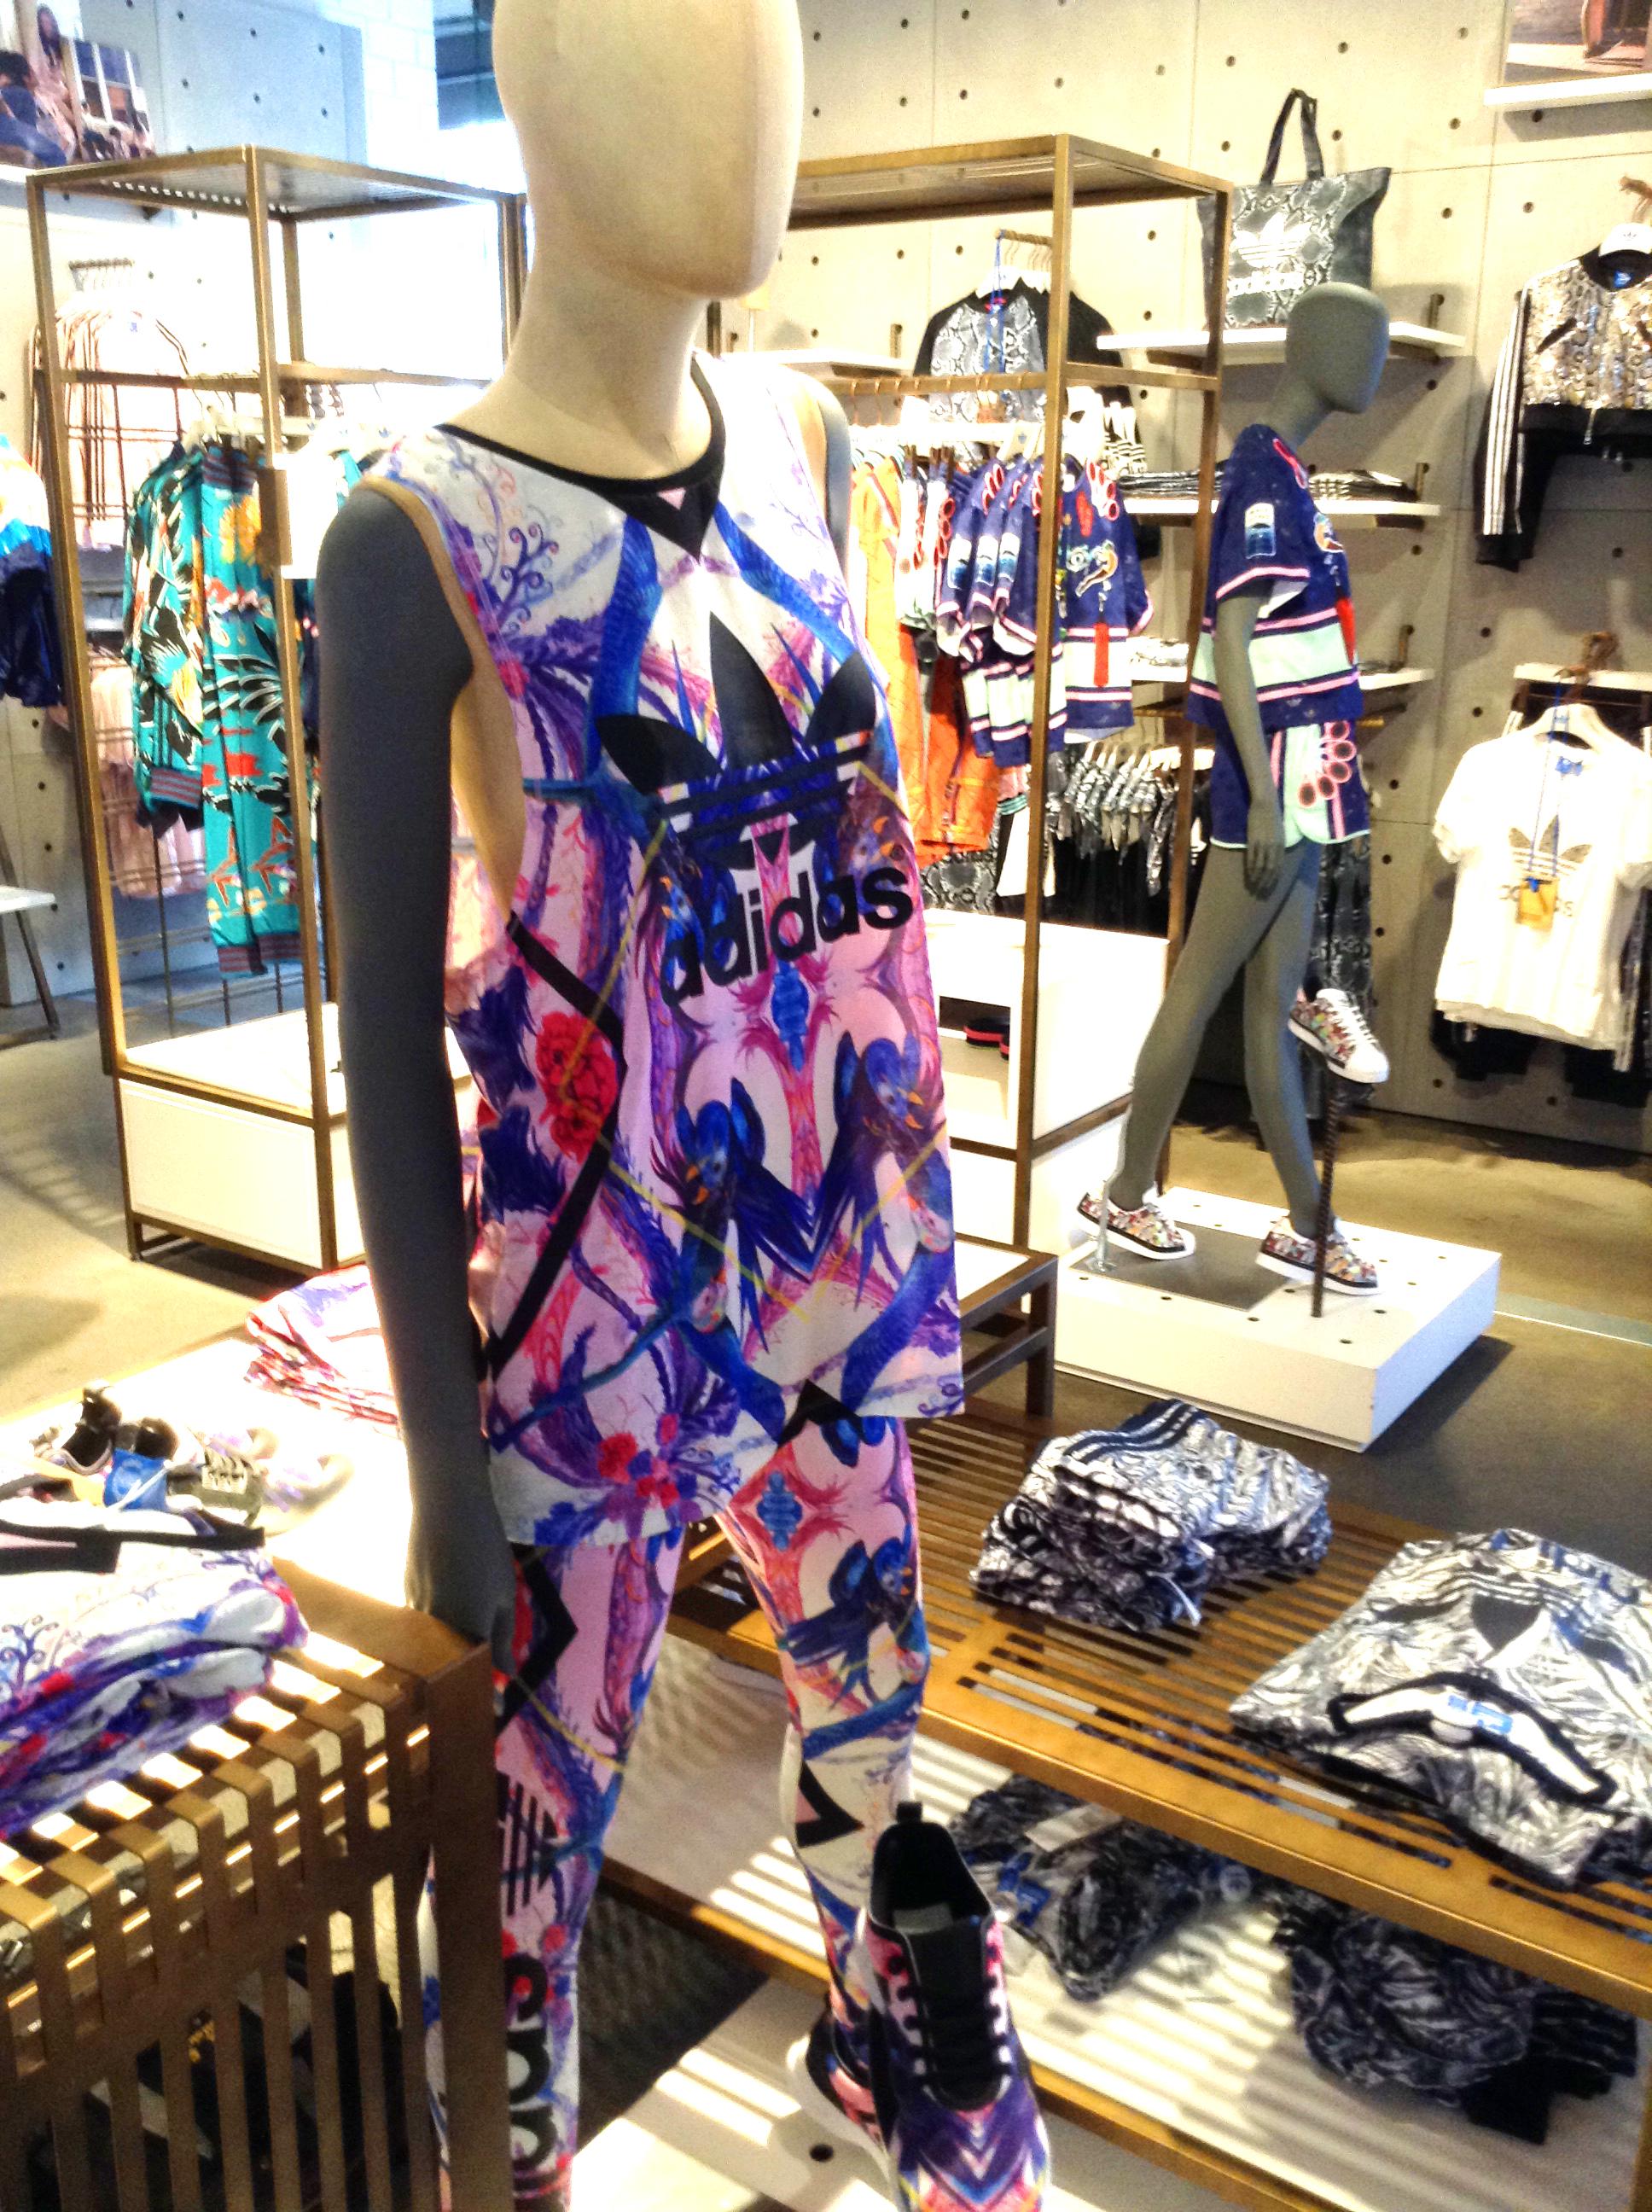 Adidas store display